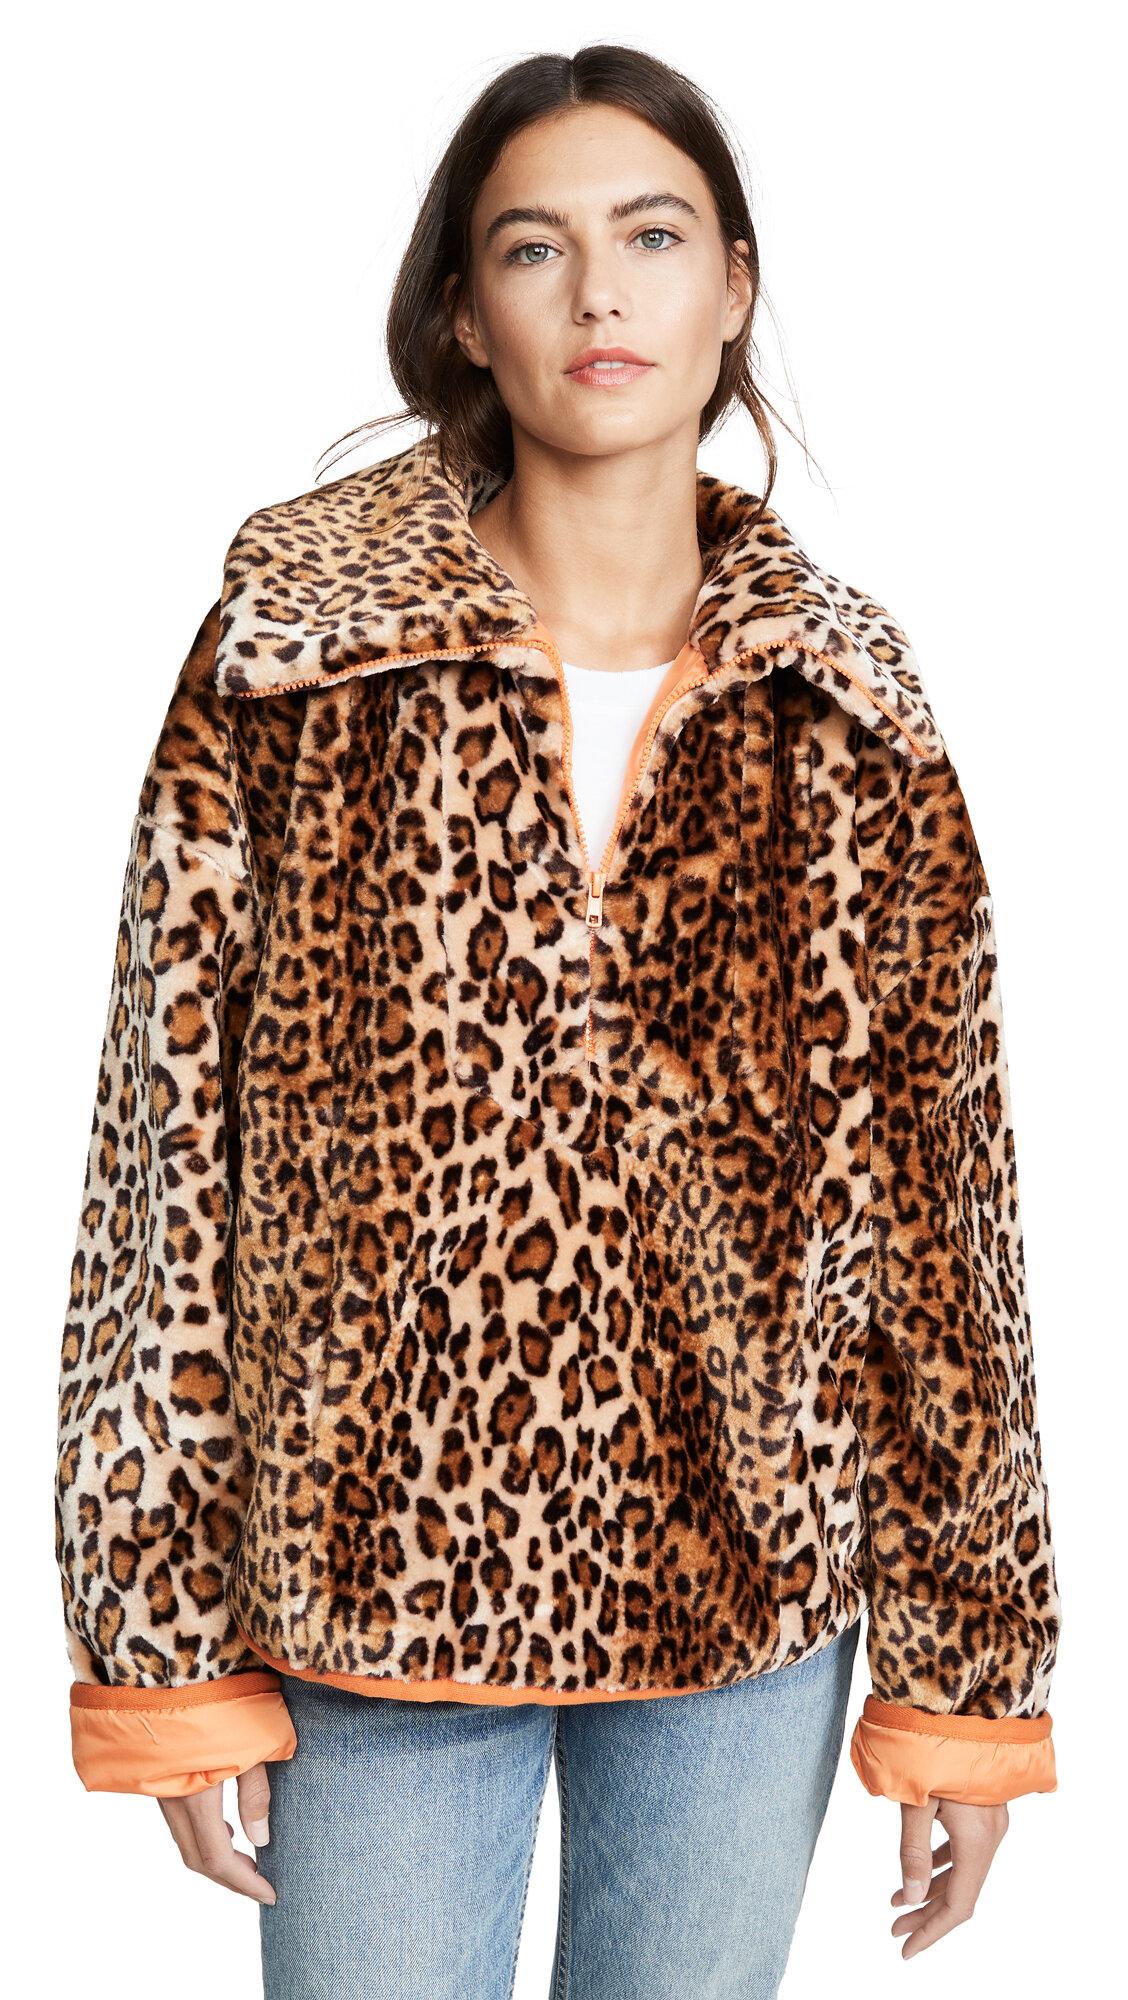 J.O.A Leopard Jacket $100